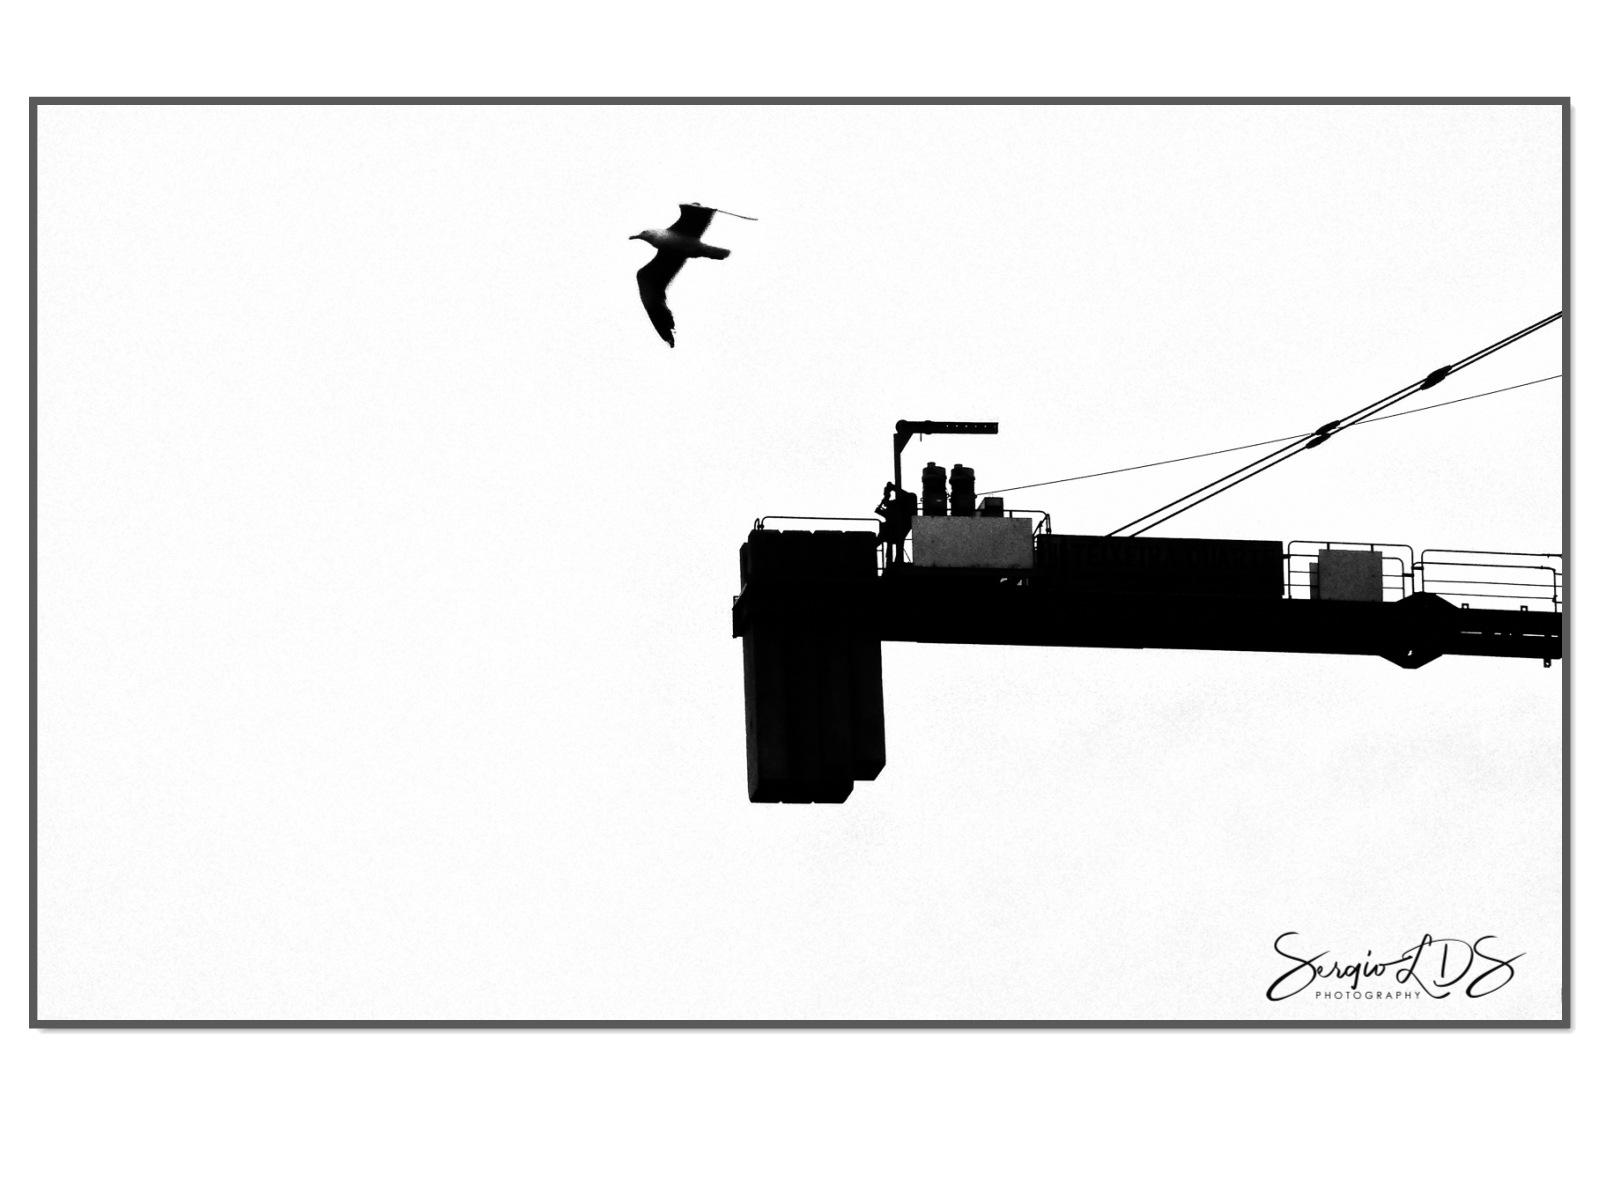 Birds & Bridges... by sergiolds